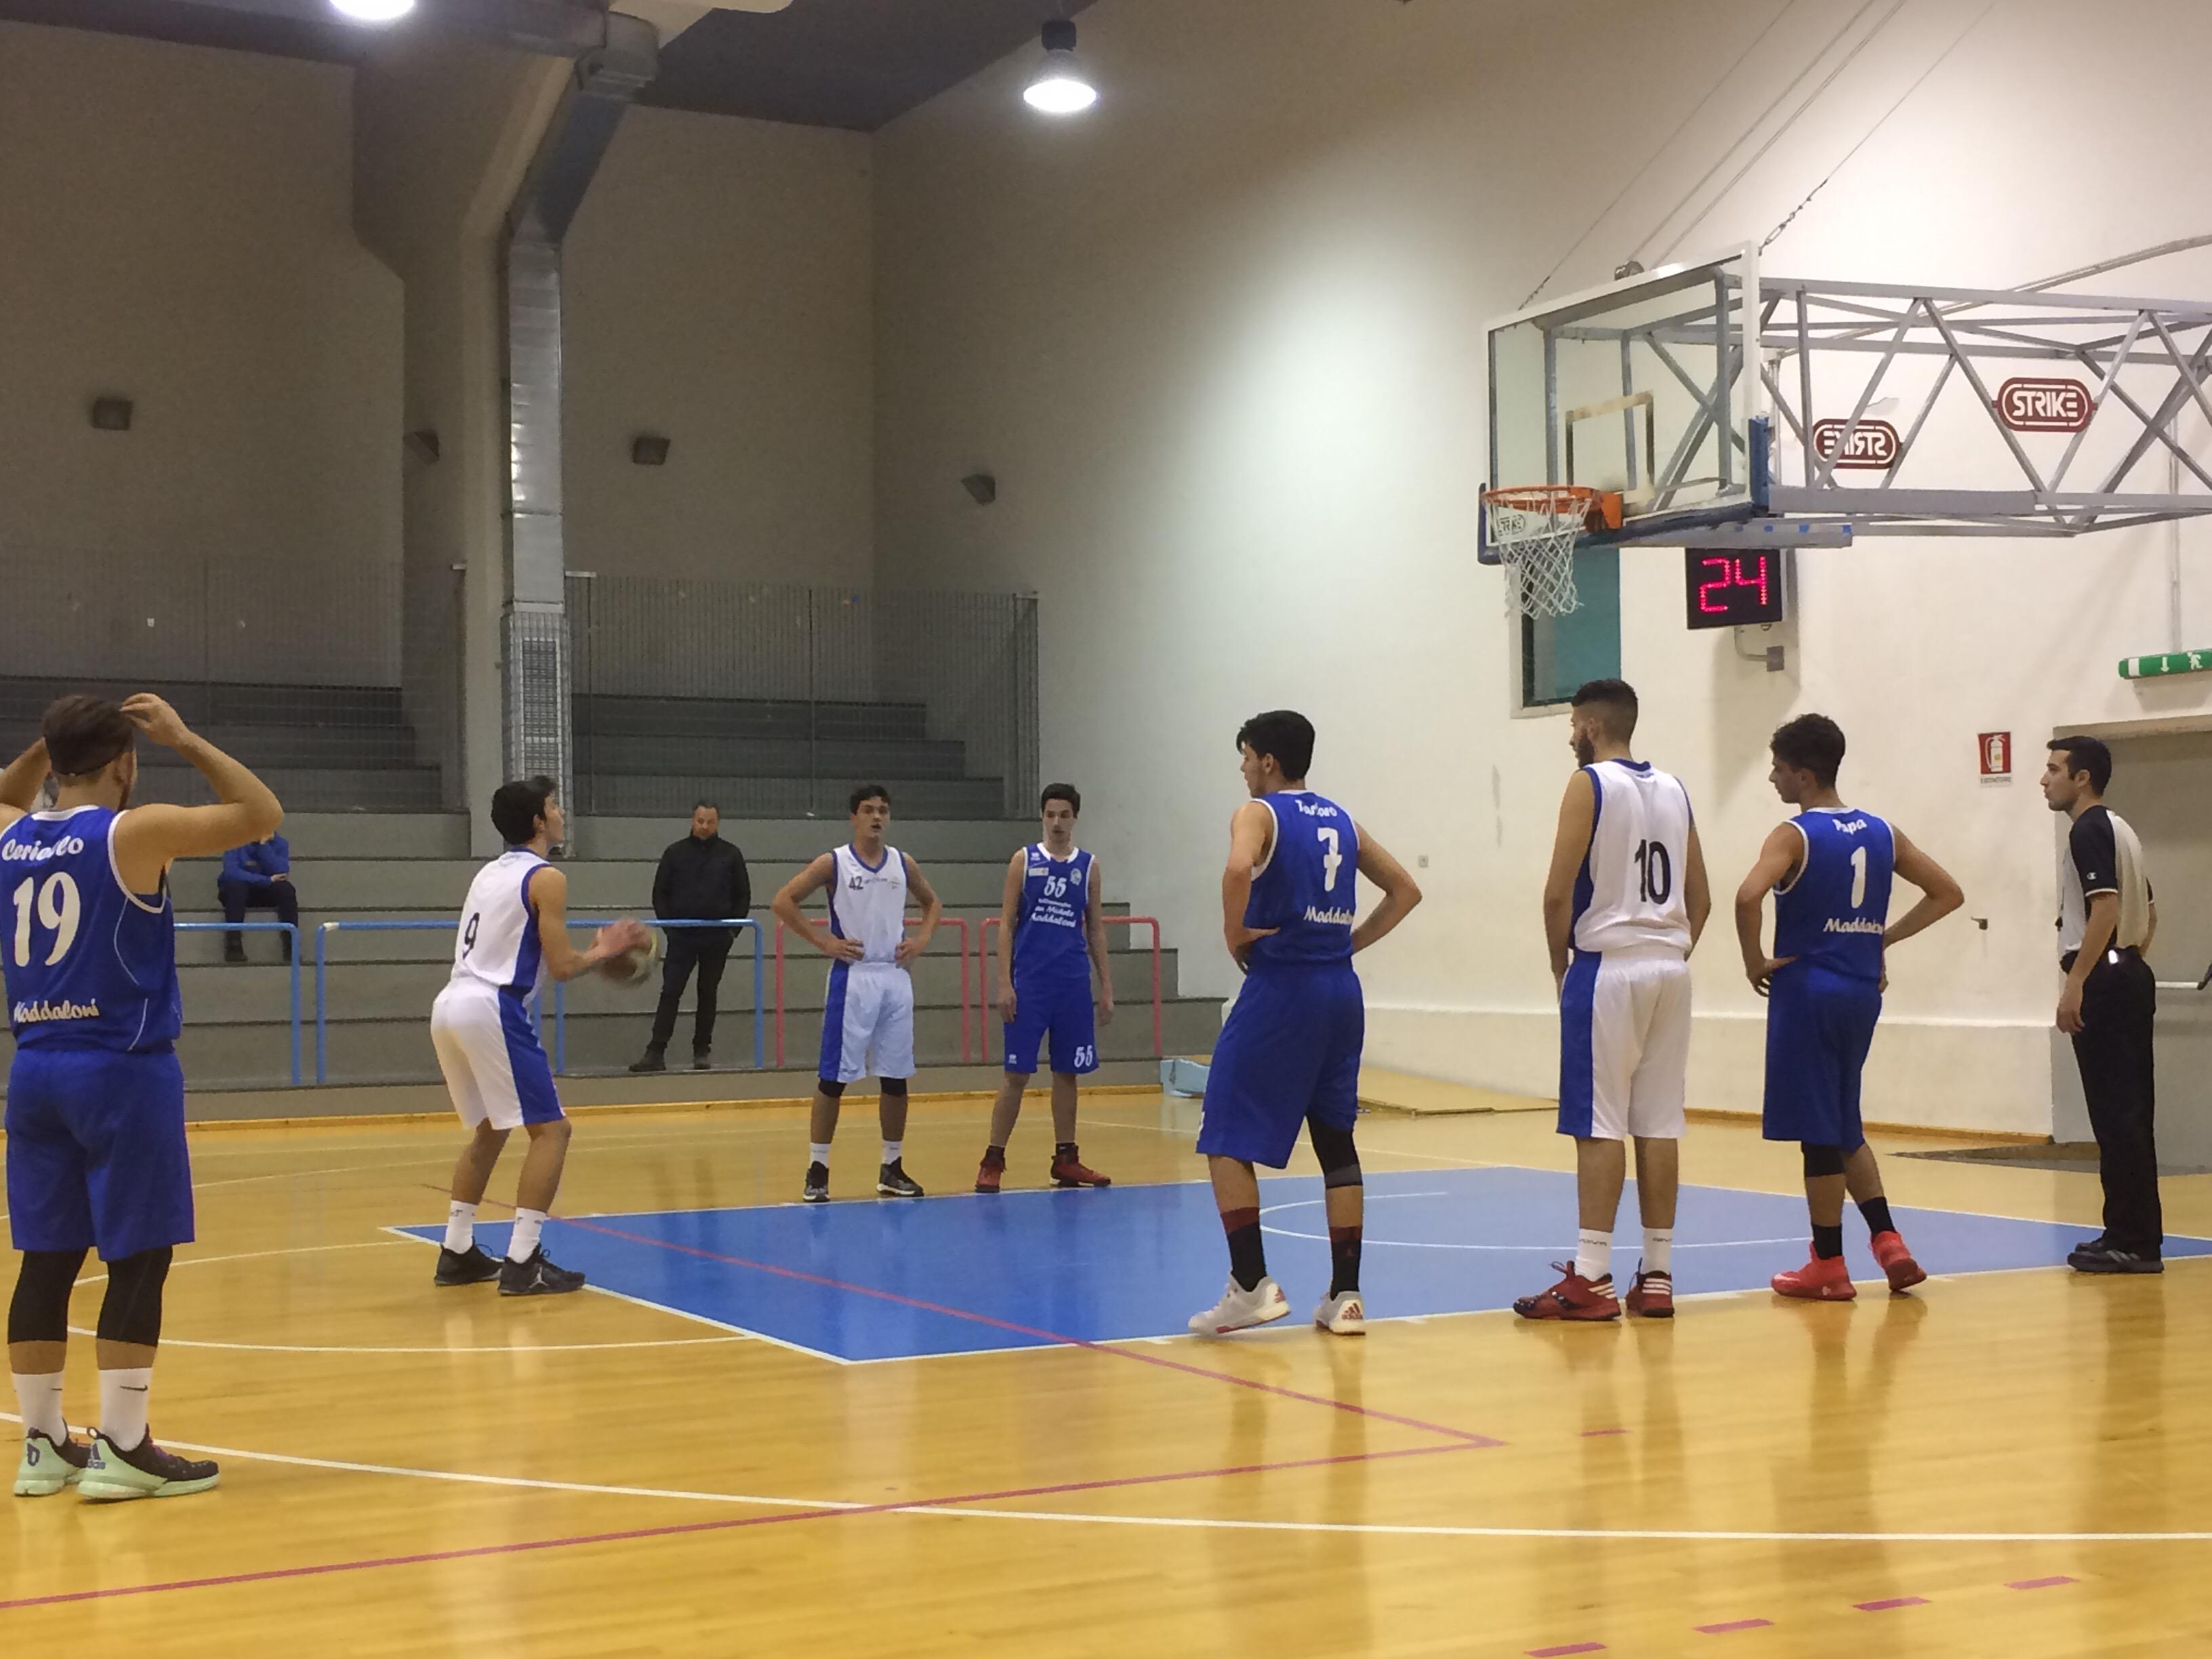 U18 Ecc: Vivi Basket forza 10